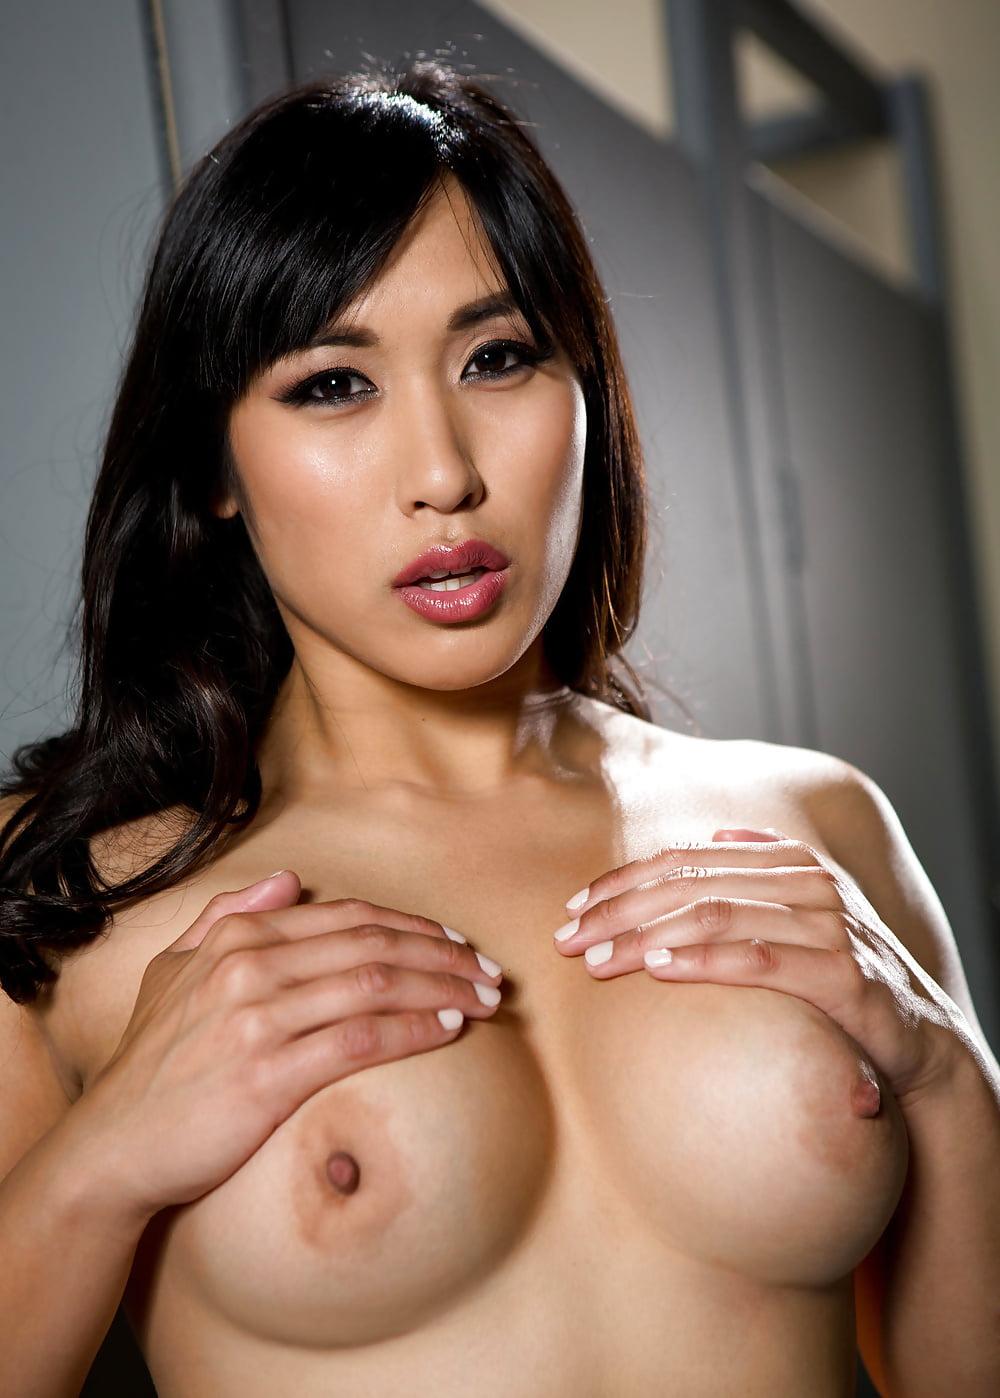 asian-female-porn-star